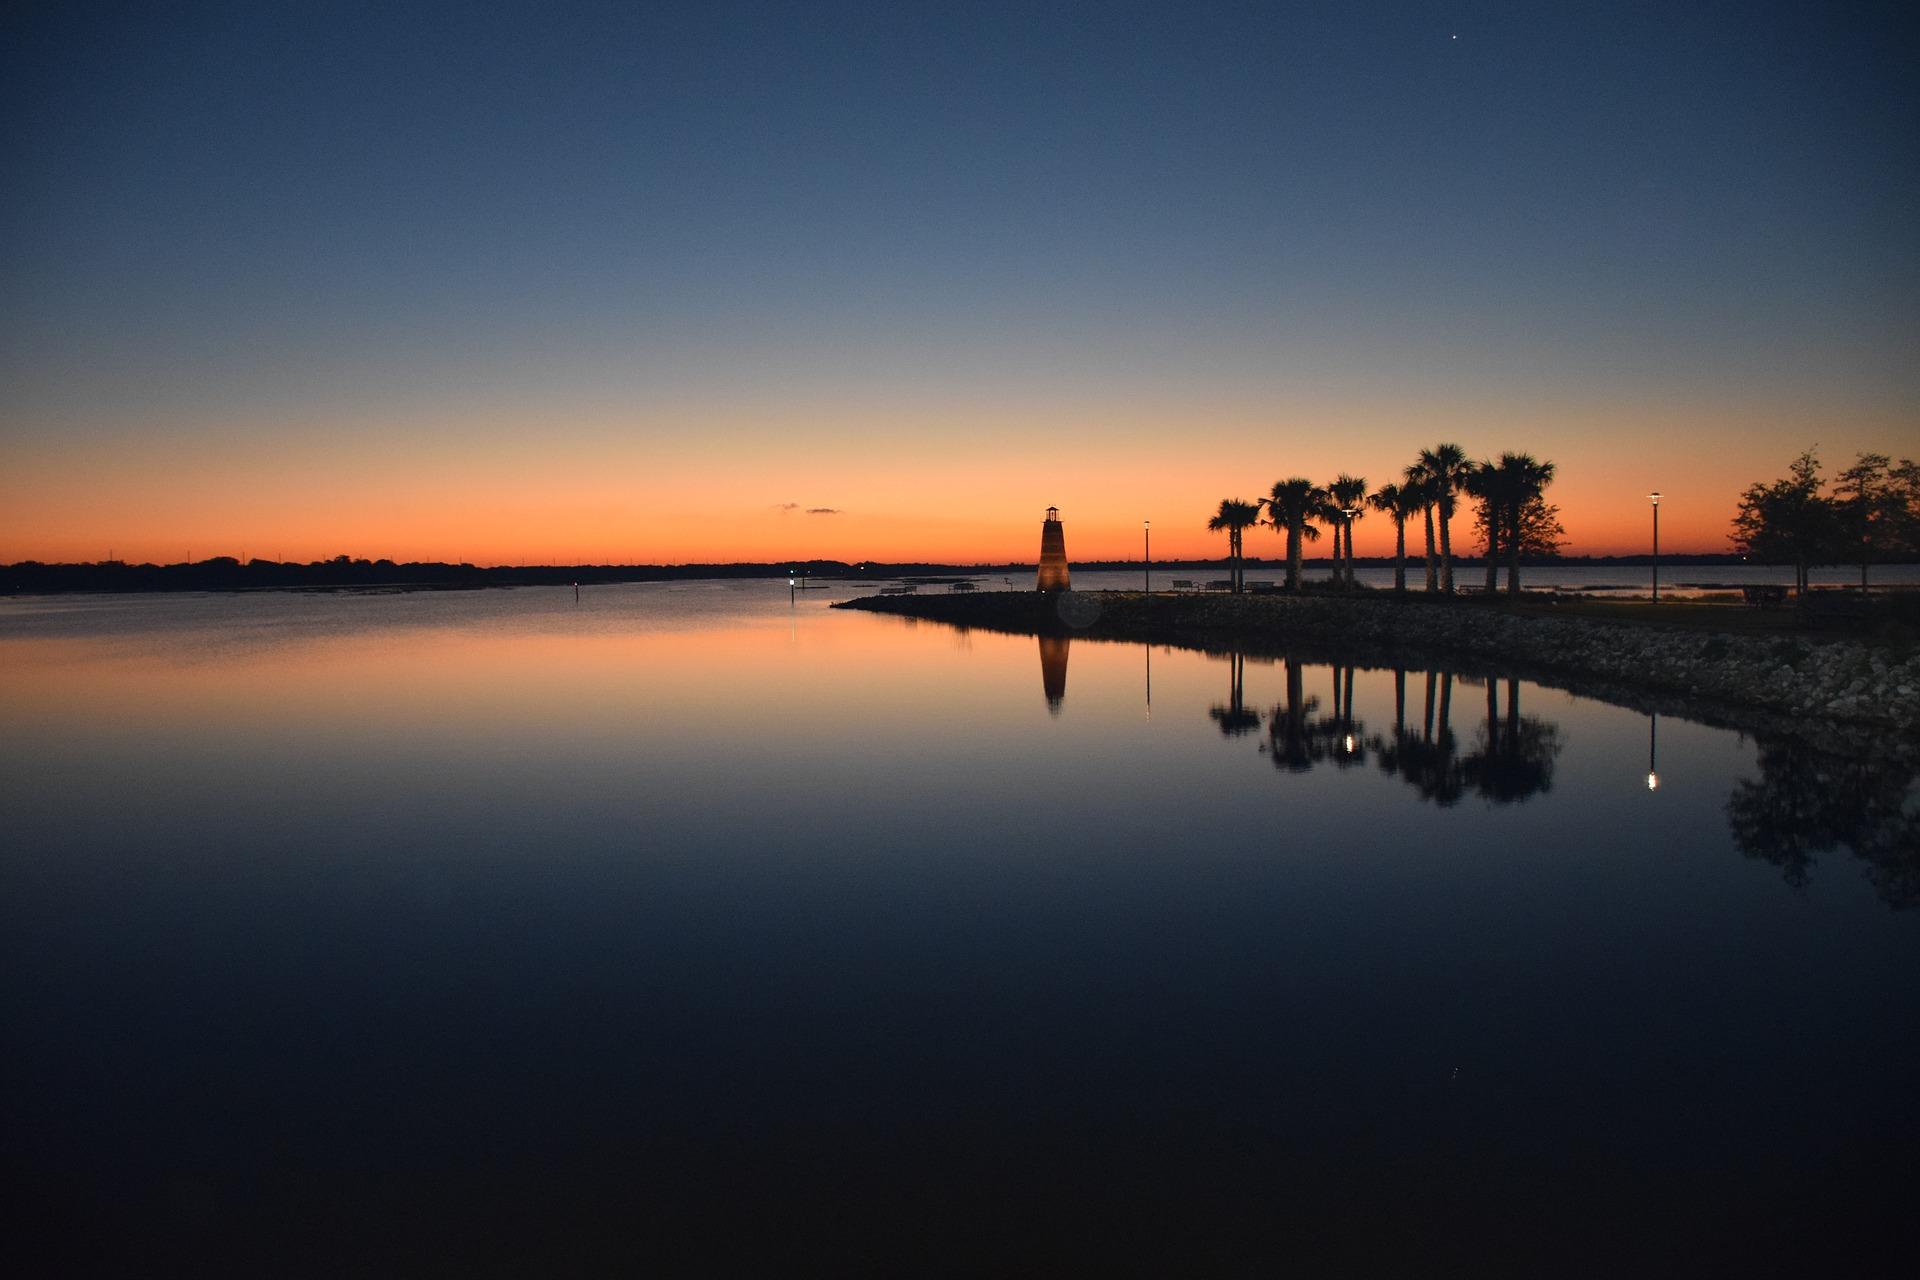 Image of a lighthouse in Kissimmee, Florida on Lake Tohopekaliga | TAB Bank